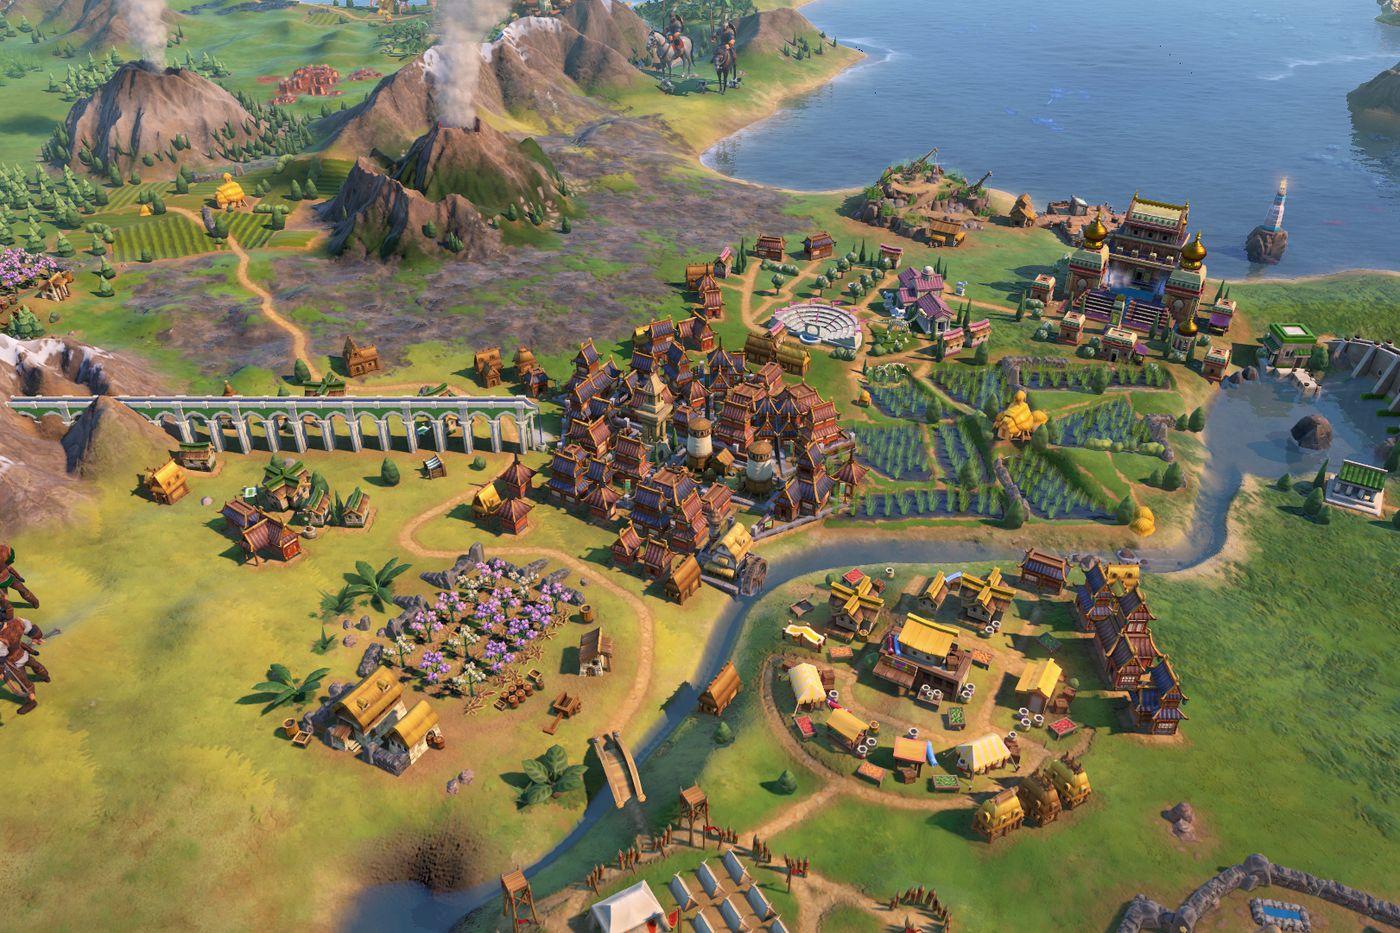 Civilization 6: Gathering Storm review: useful evolution, but poor